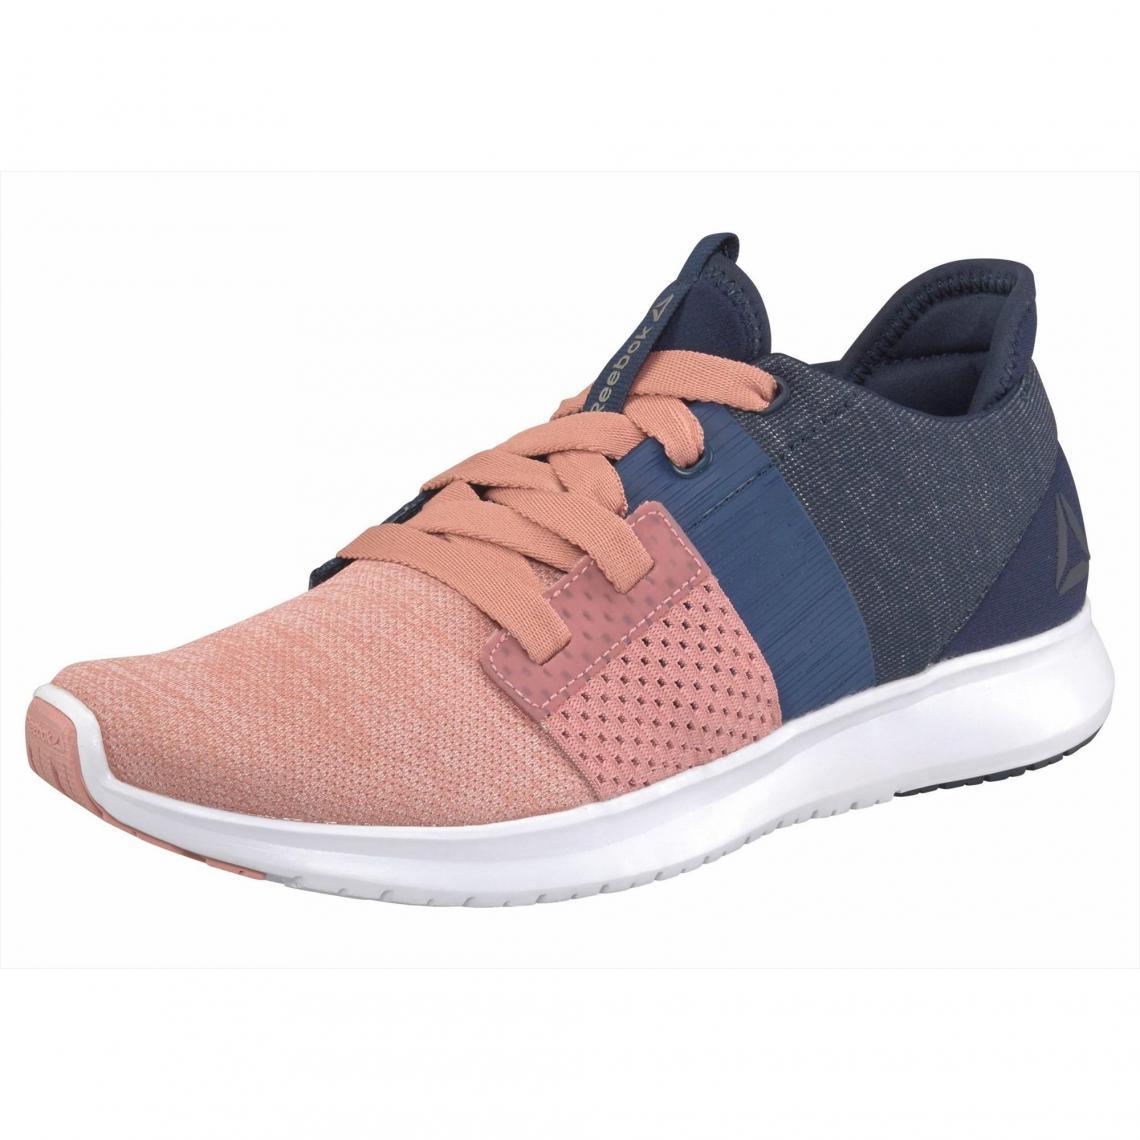 Chaussures de running femme Reebok Trilux Run Rose Gris Plus de détails